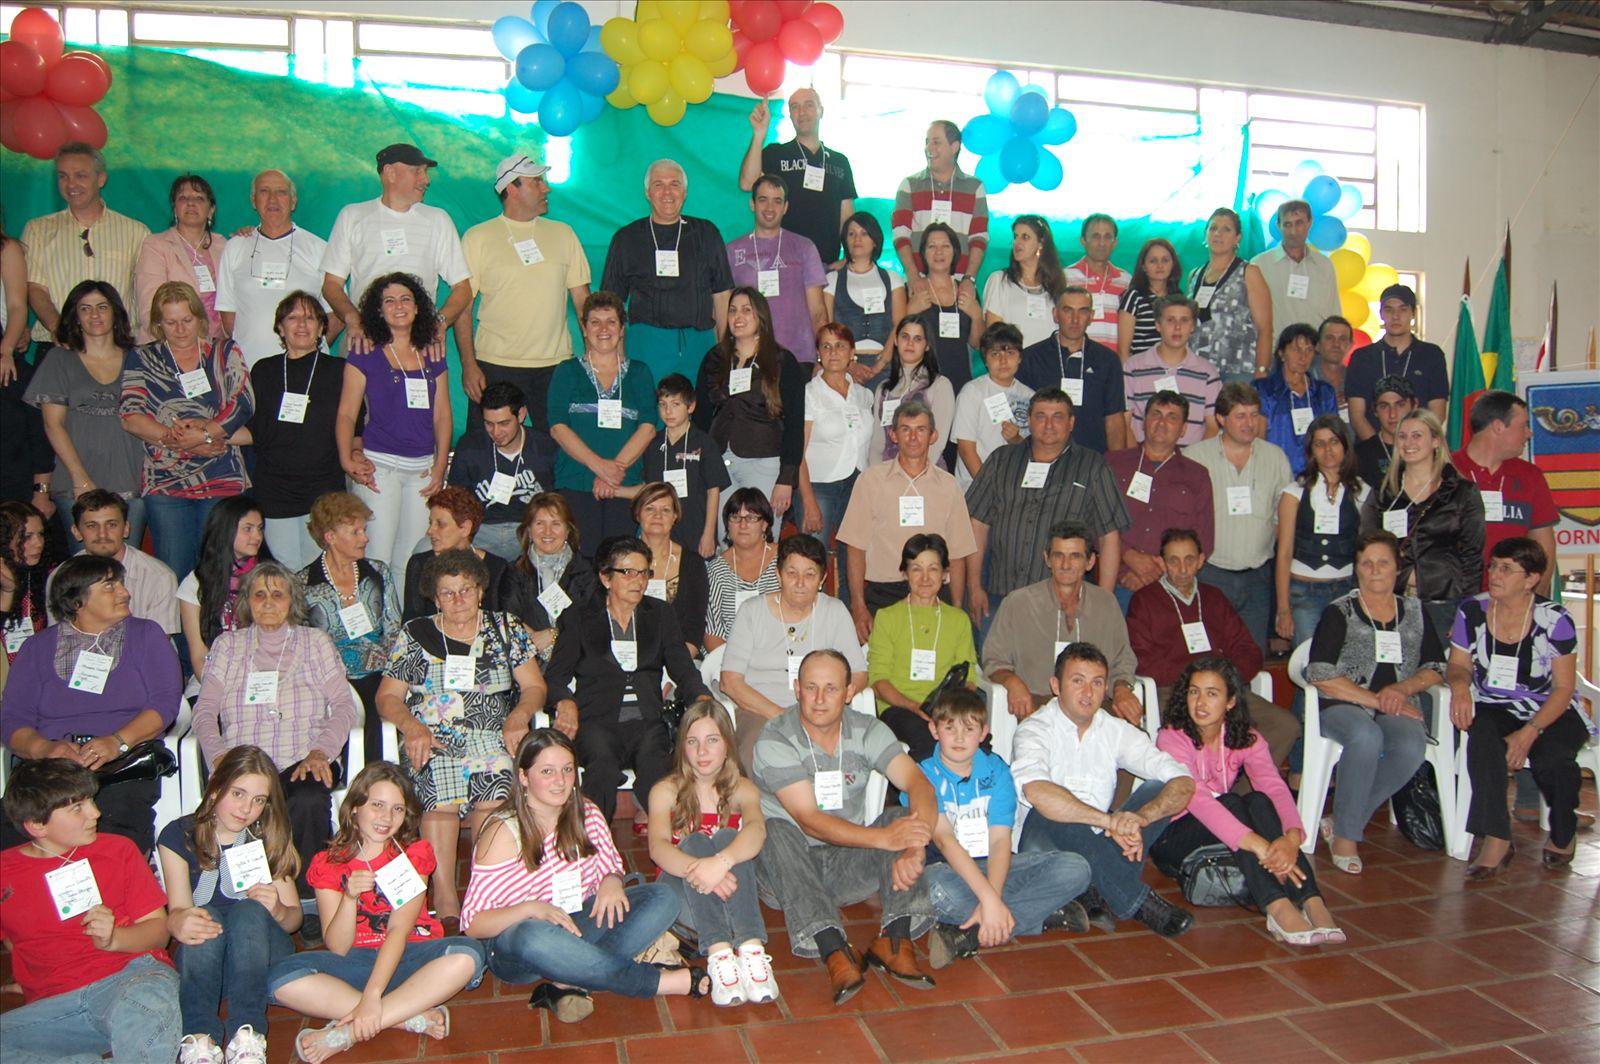 2º Encontro Família Cornelli - 11.10.2009 (164)_0